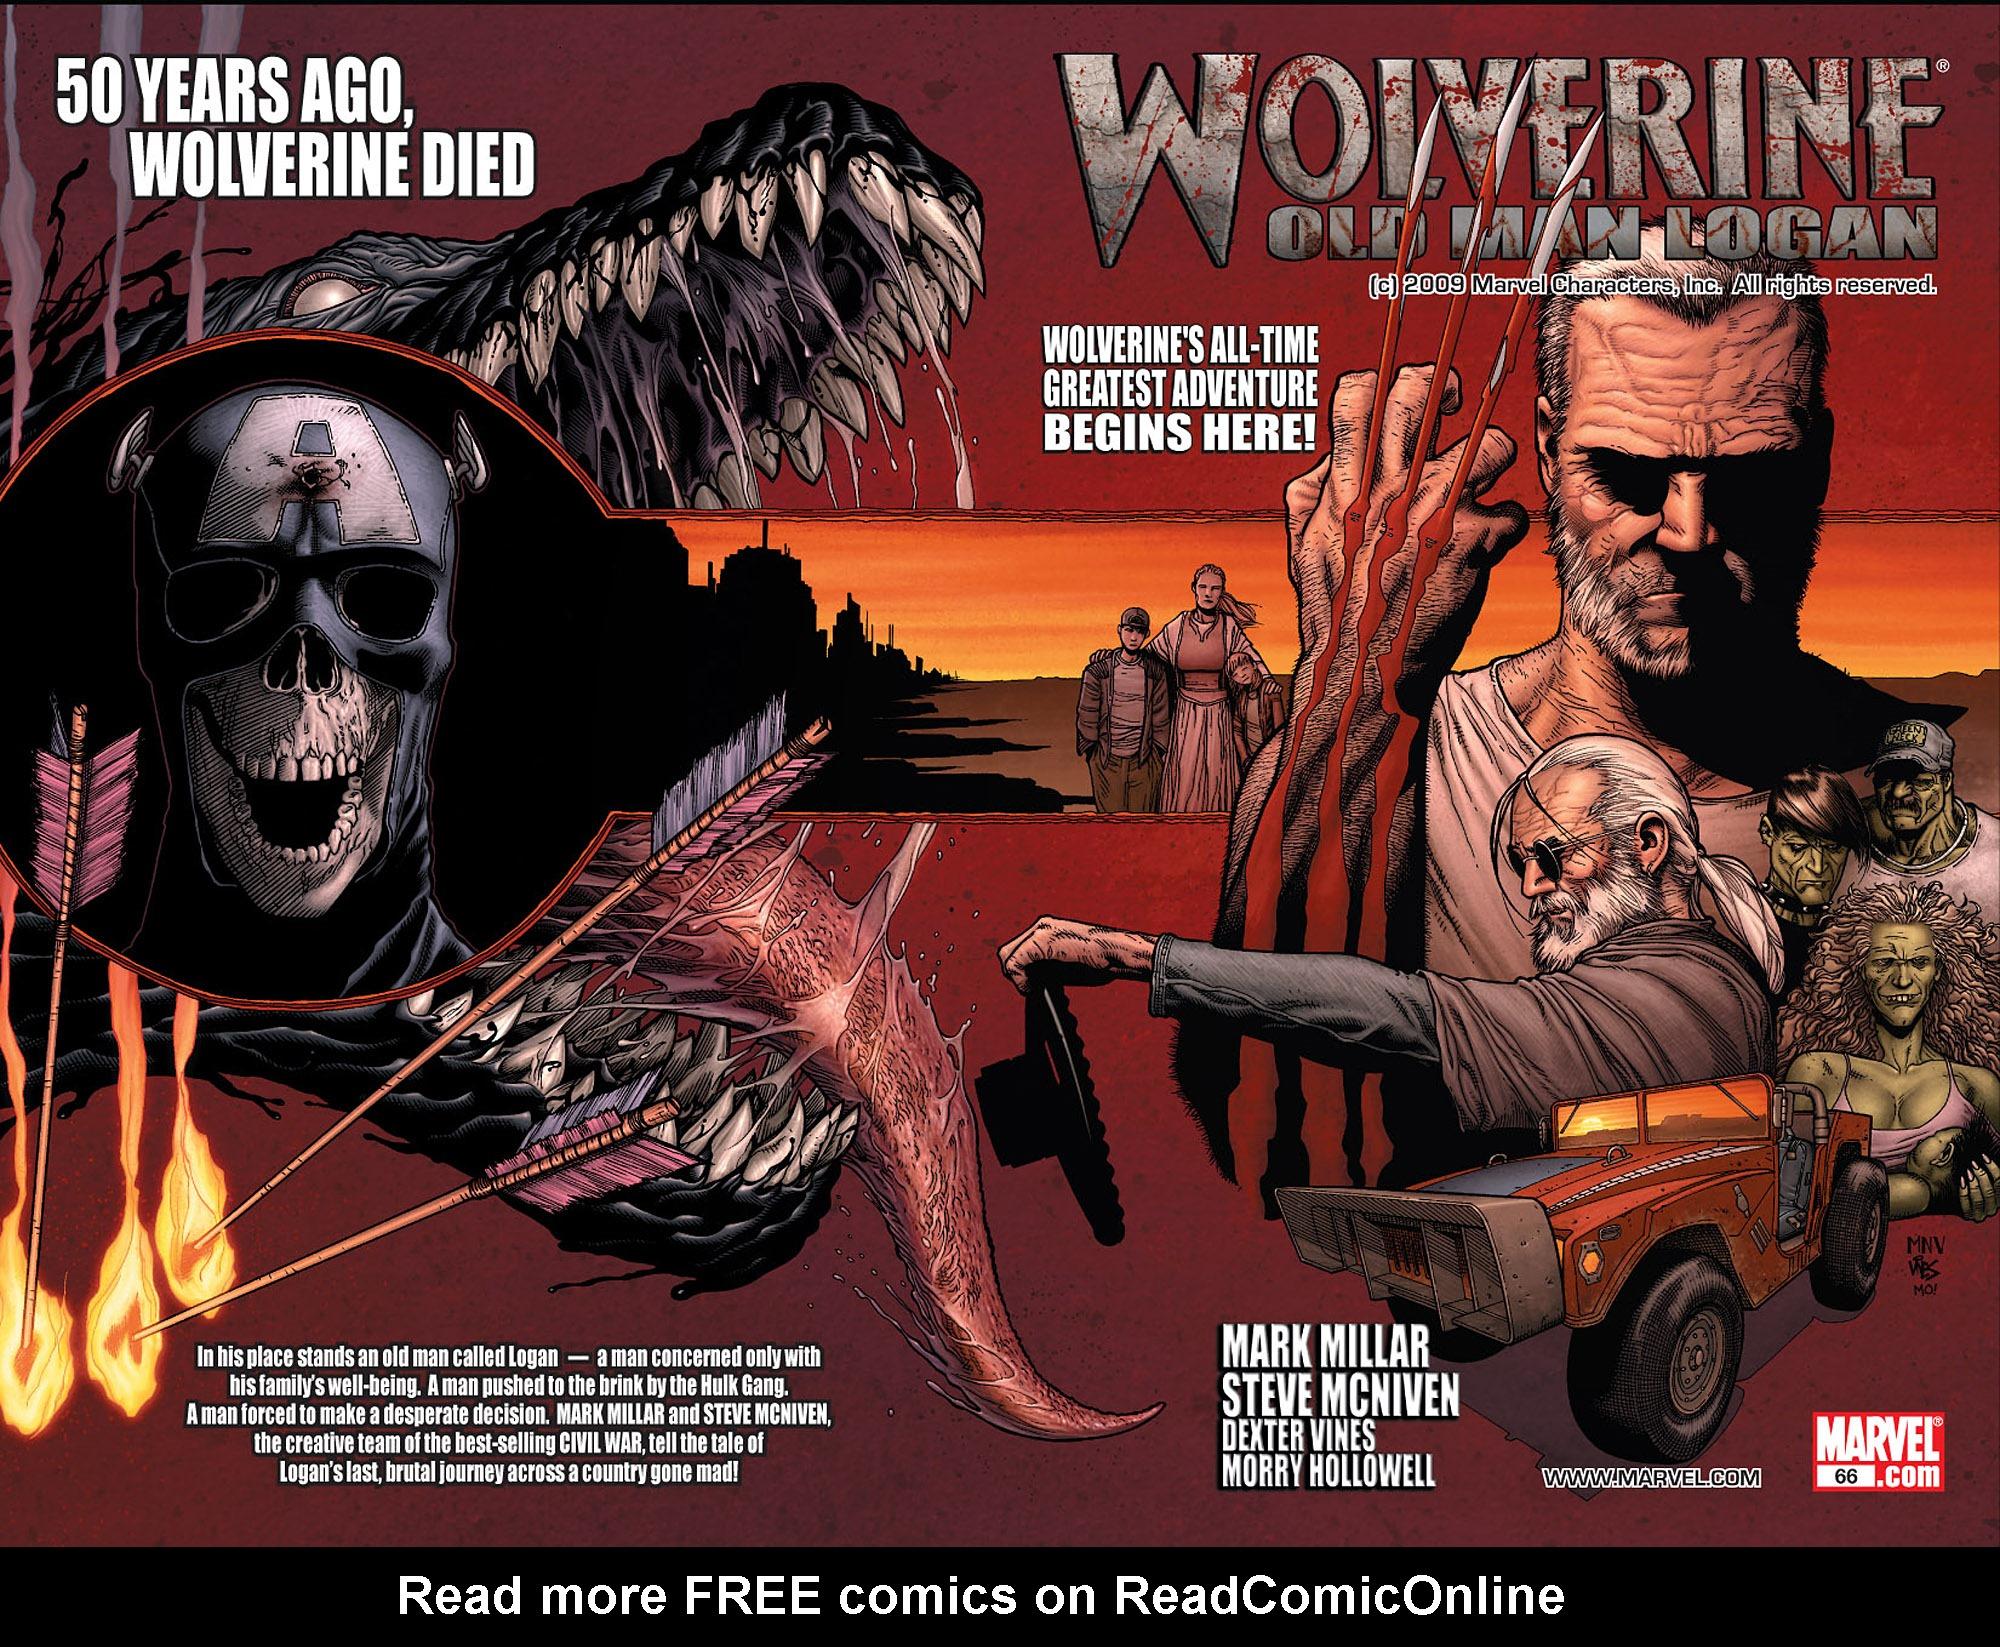 Read online Wolverine: Old Man Logan comic -  Issue # Full - 3